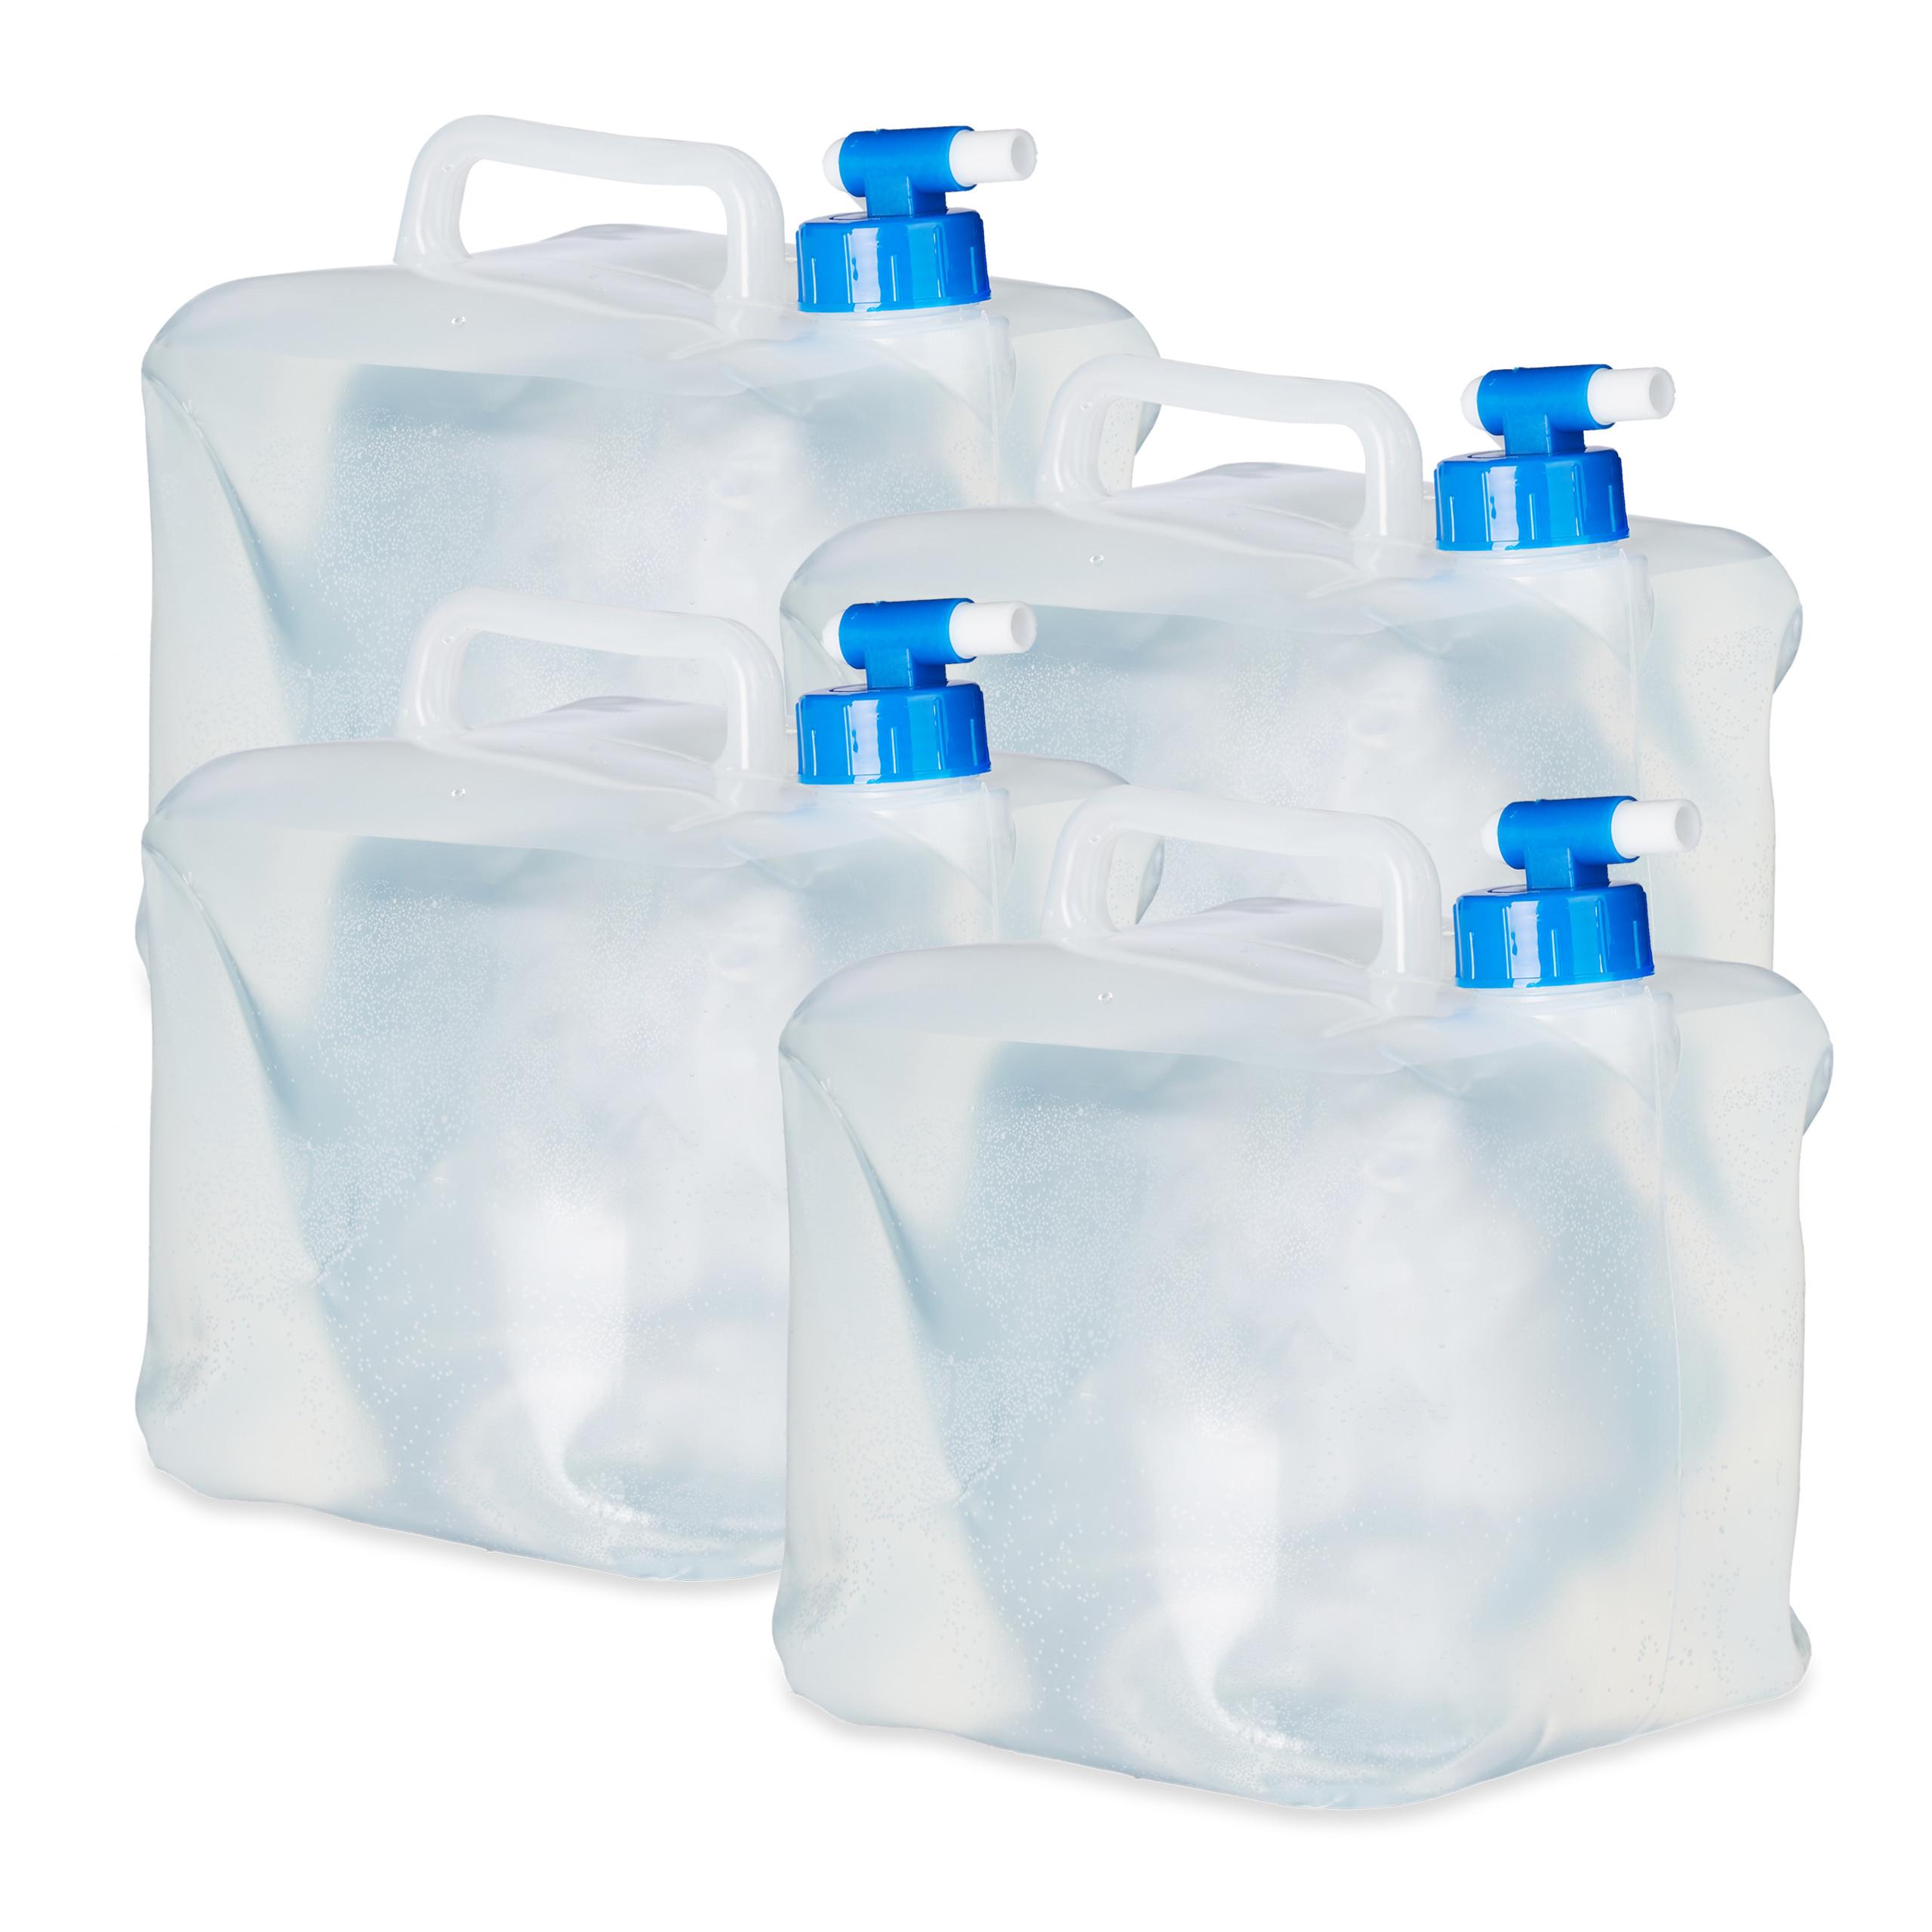 Wasserkanister faltbar 4er Set Lebensmittelecht Faltkanister Camping 5 ,10, 15 L